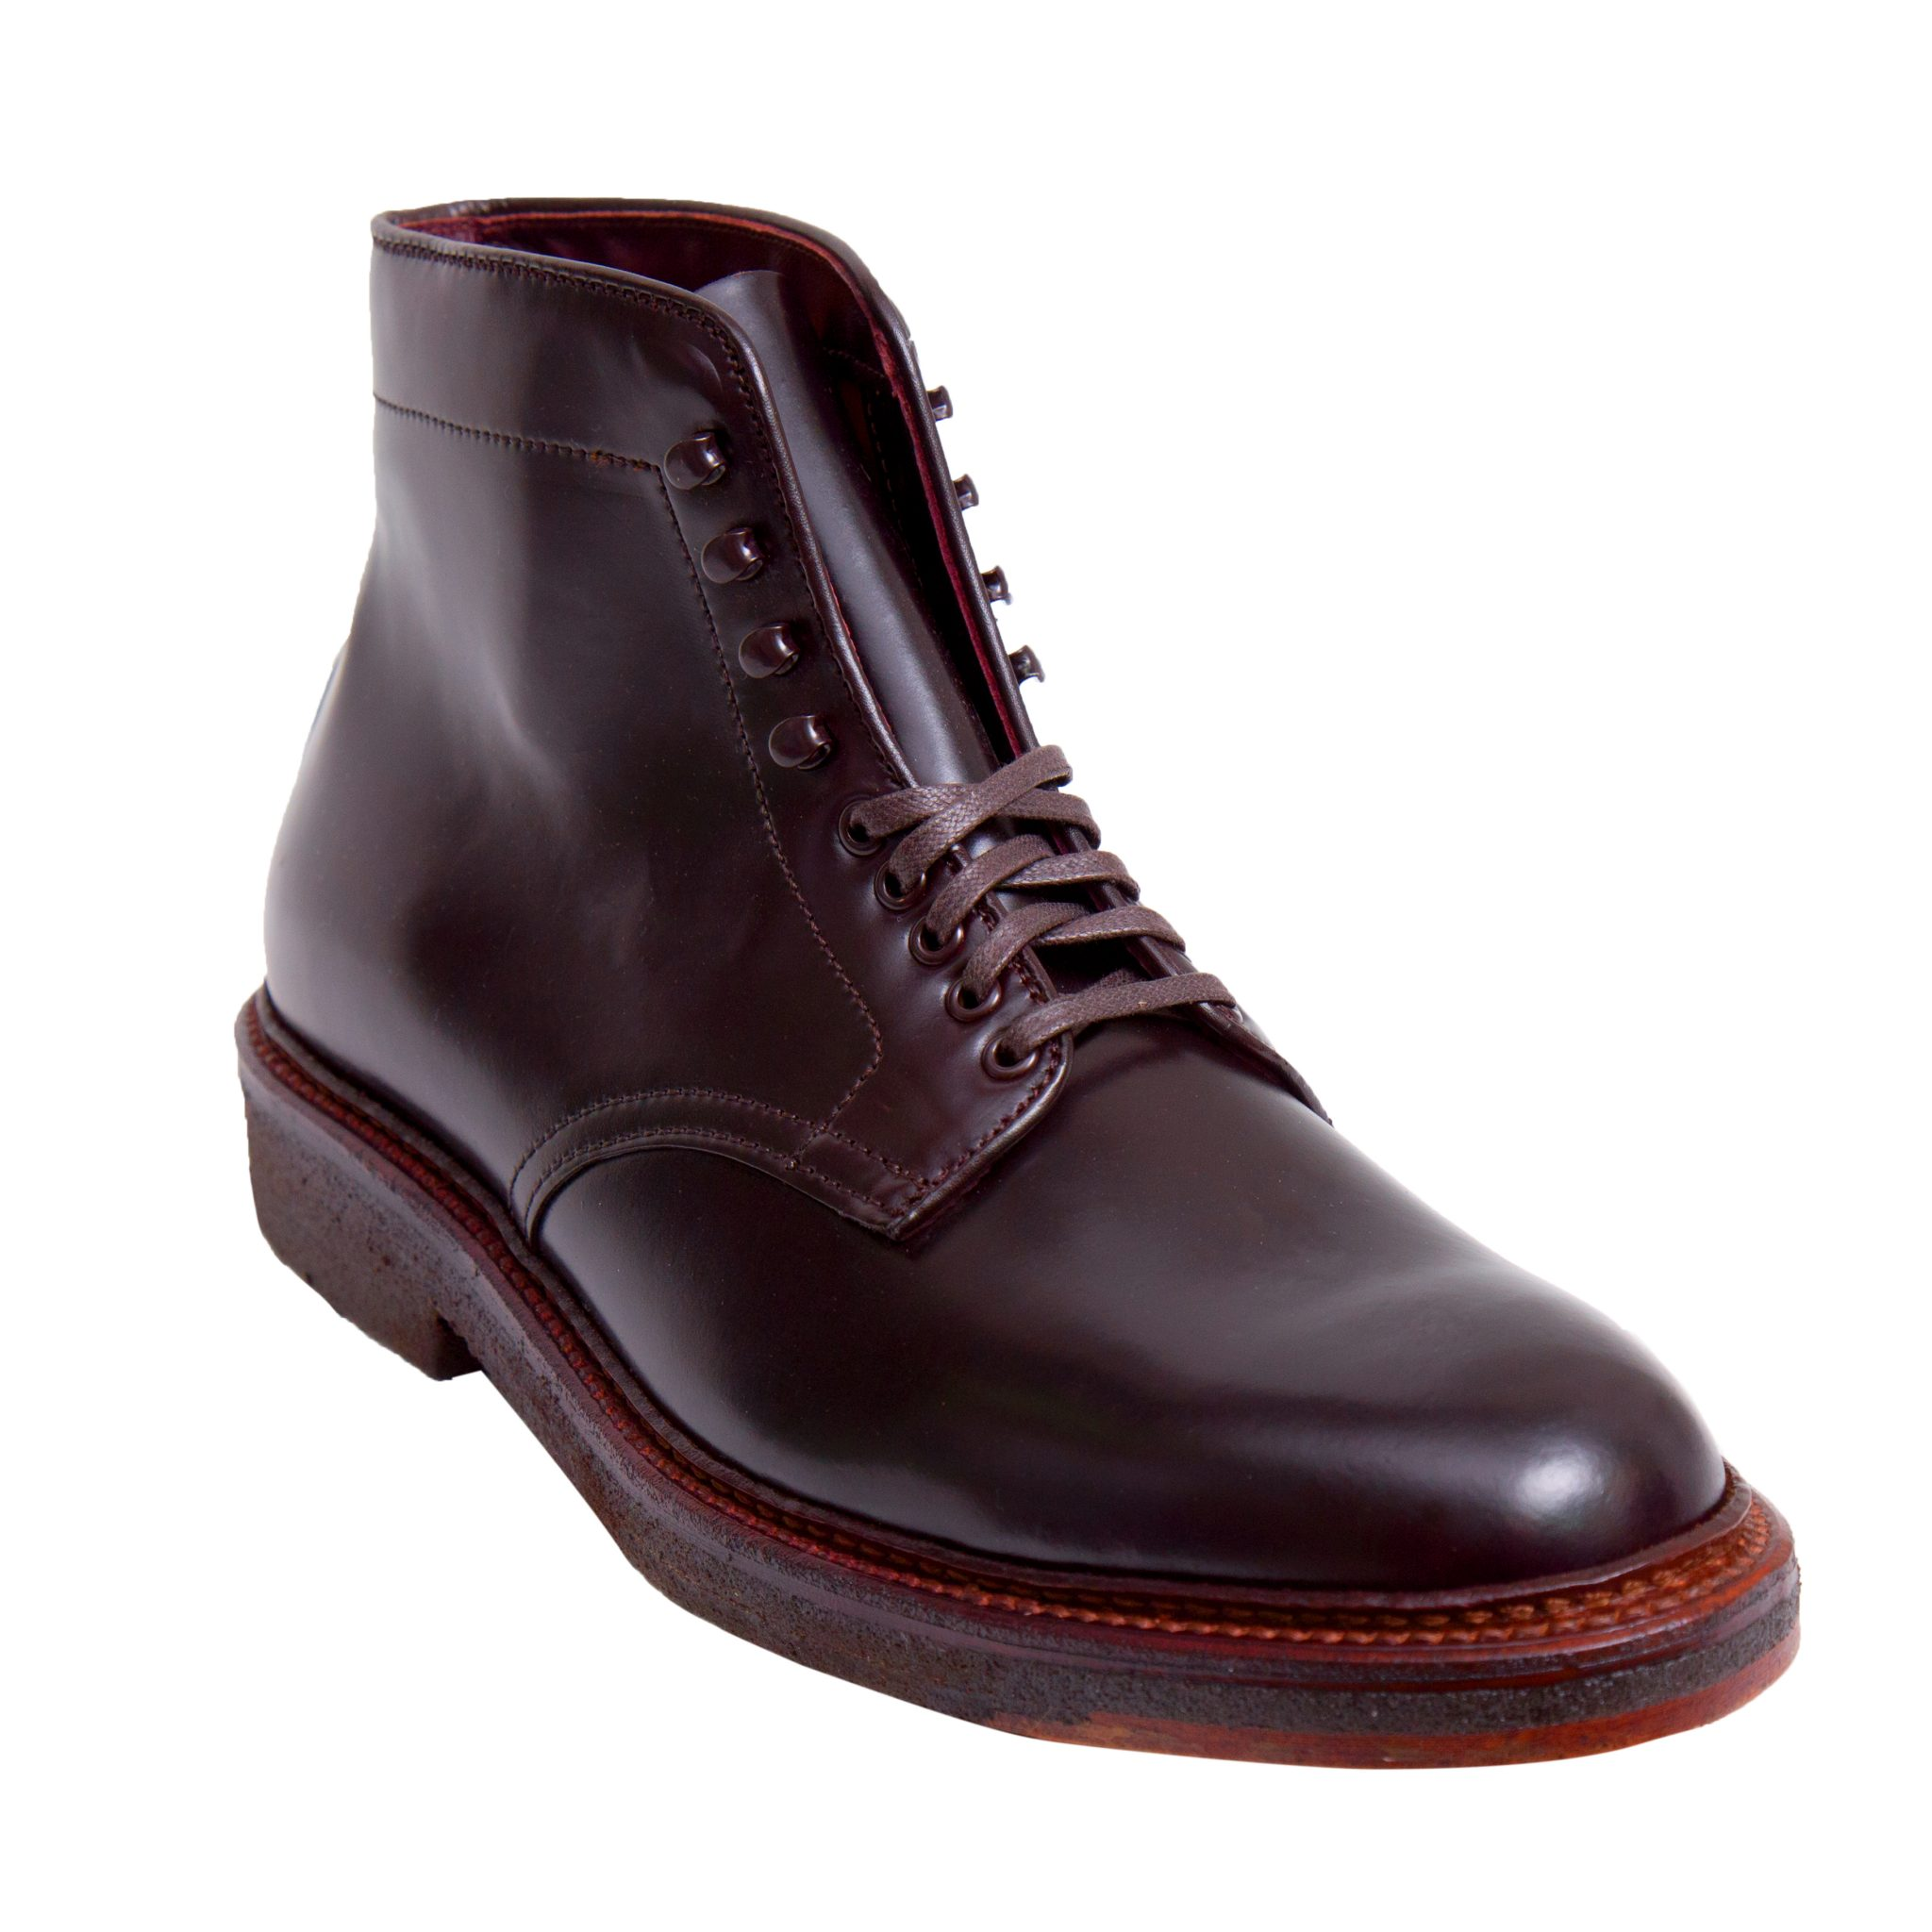 shell cordovan alden shoes